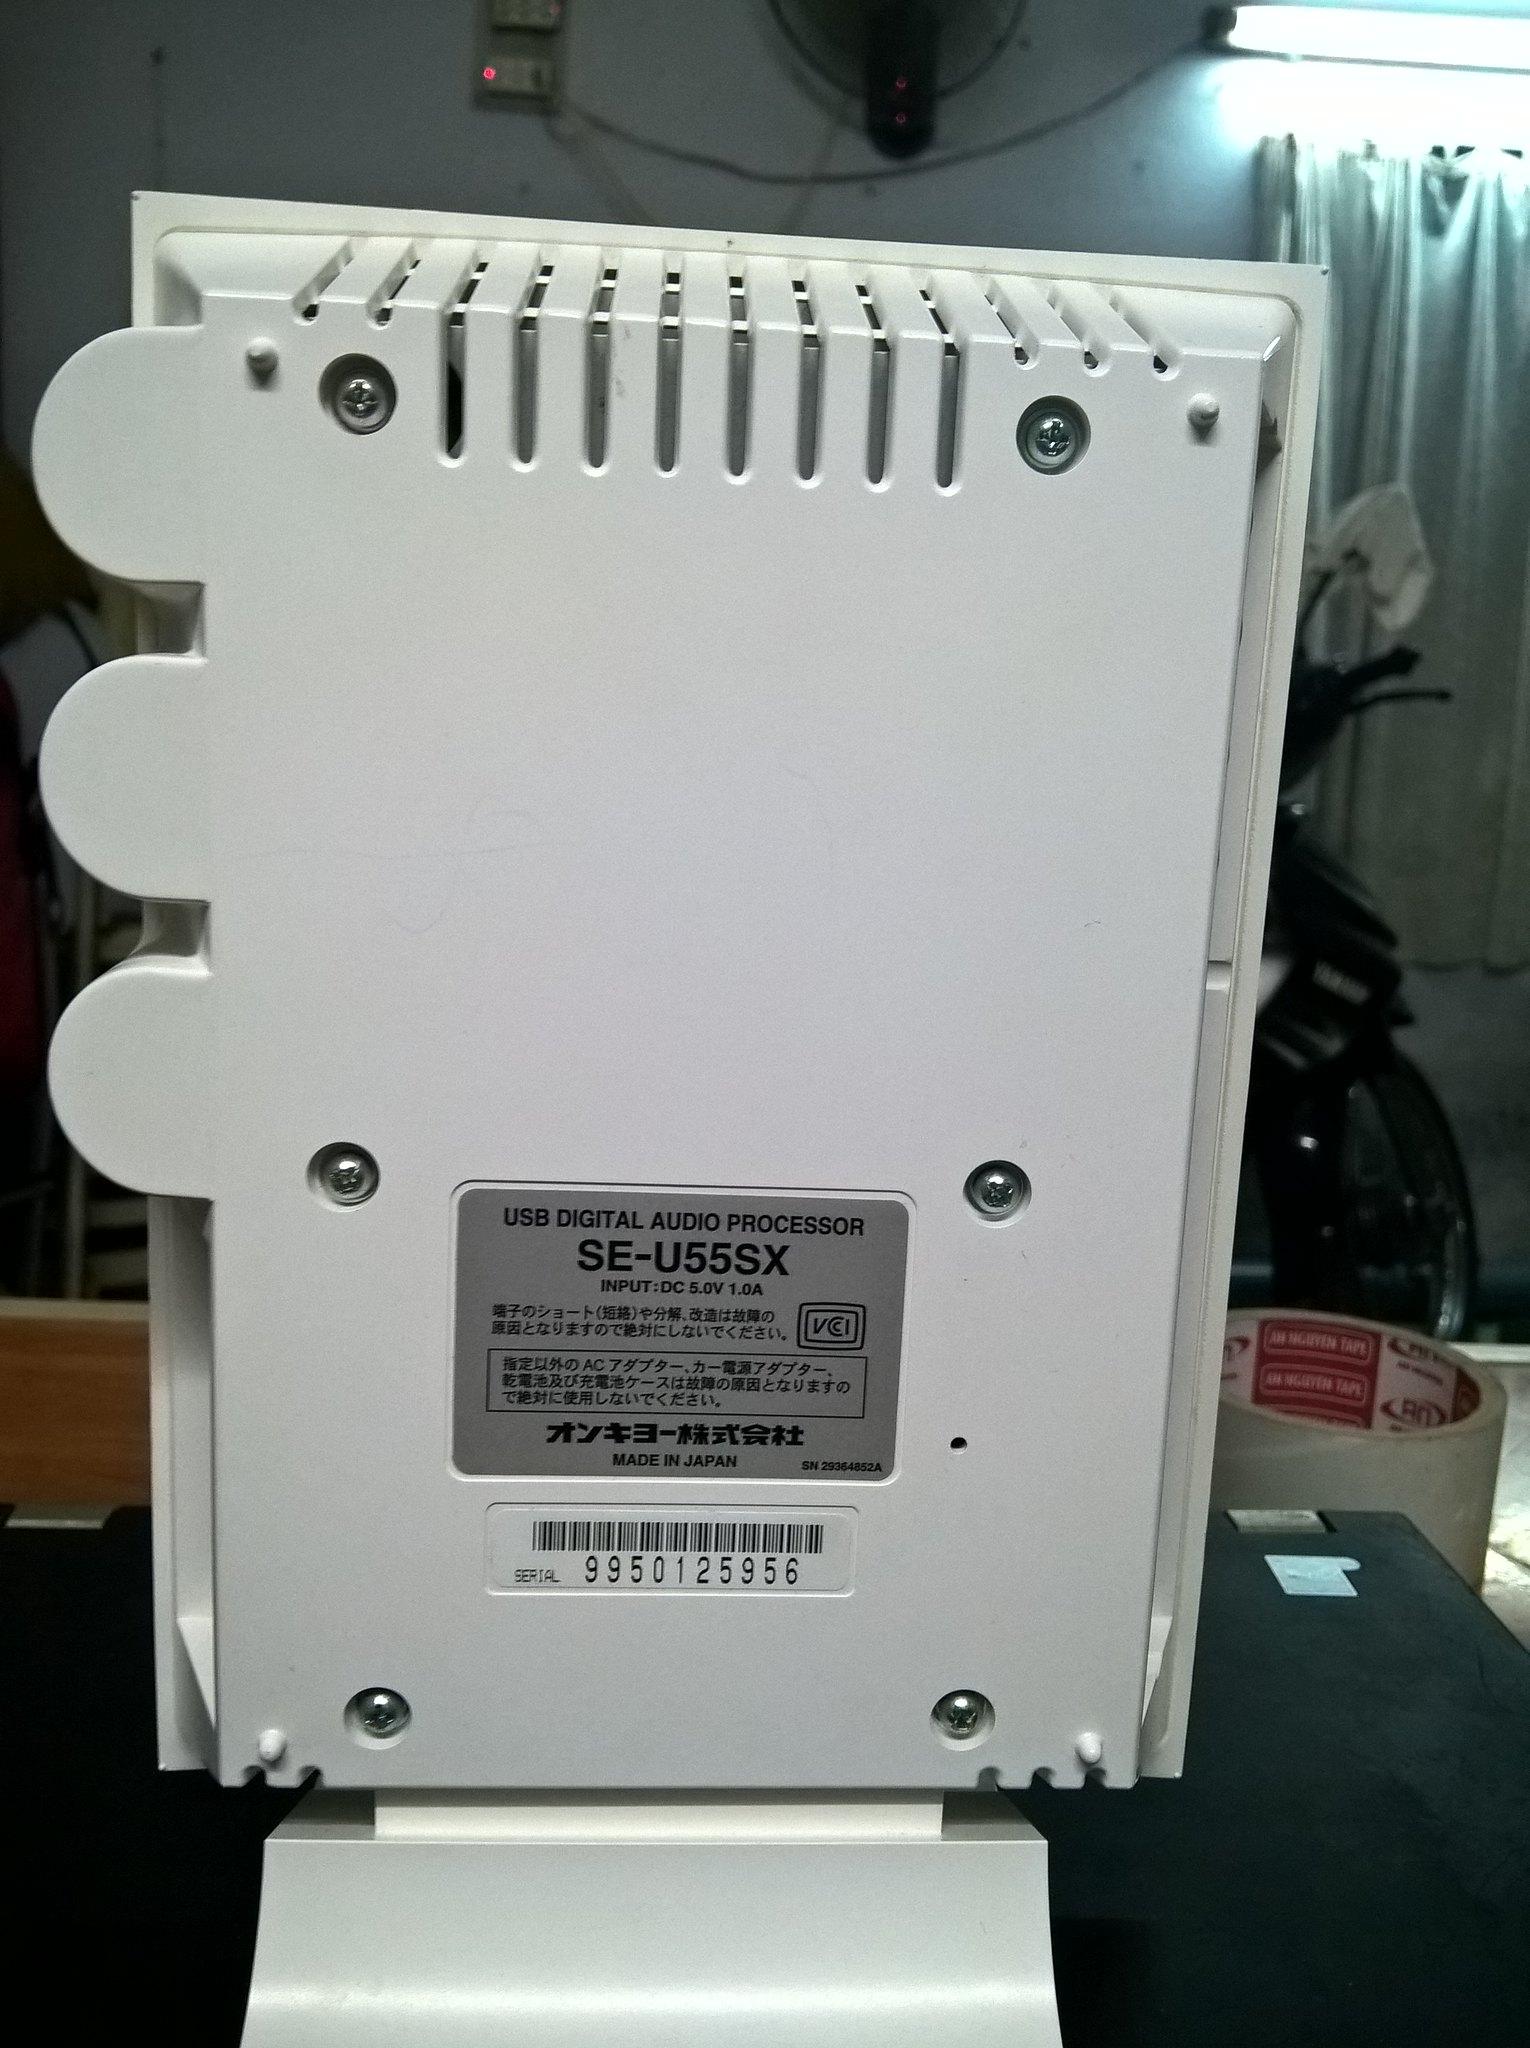 Onkyo từ Japan - U55SX, U55SX2, 200PCI LTD, 200PCI, 150PCI, 90PCI - 1